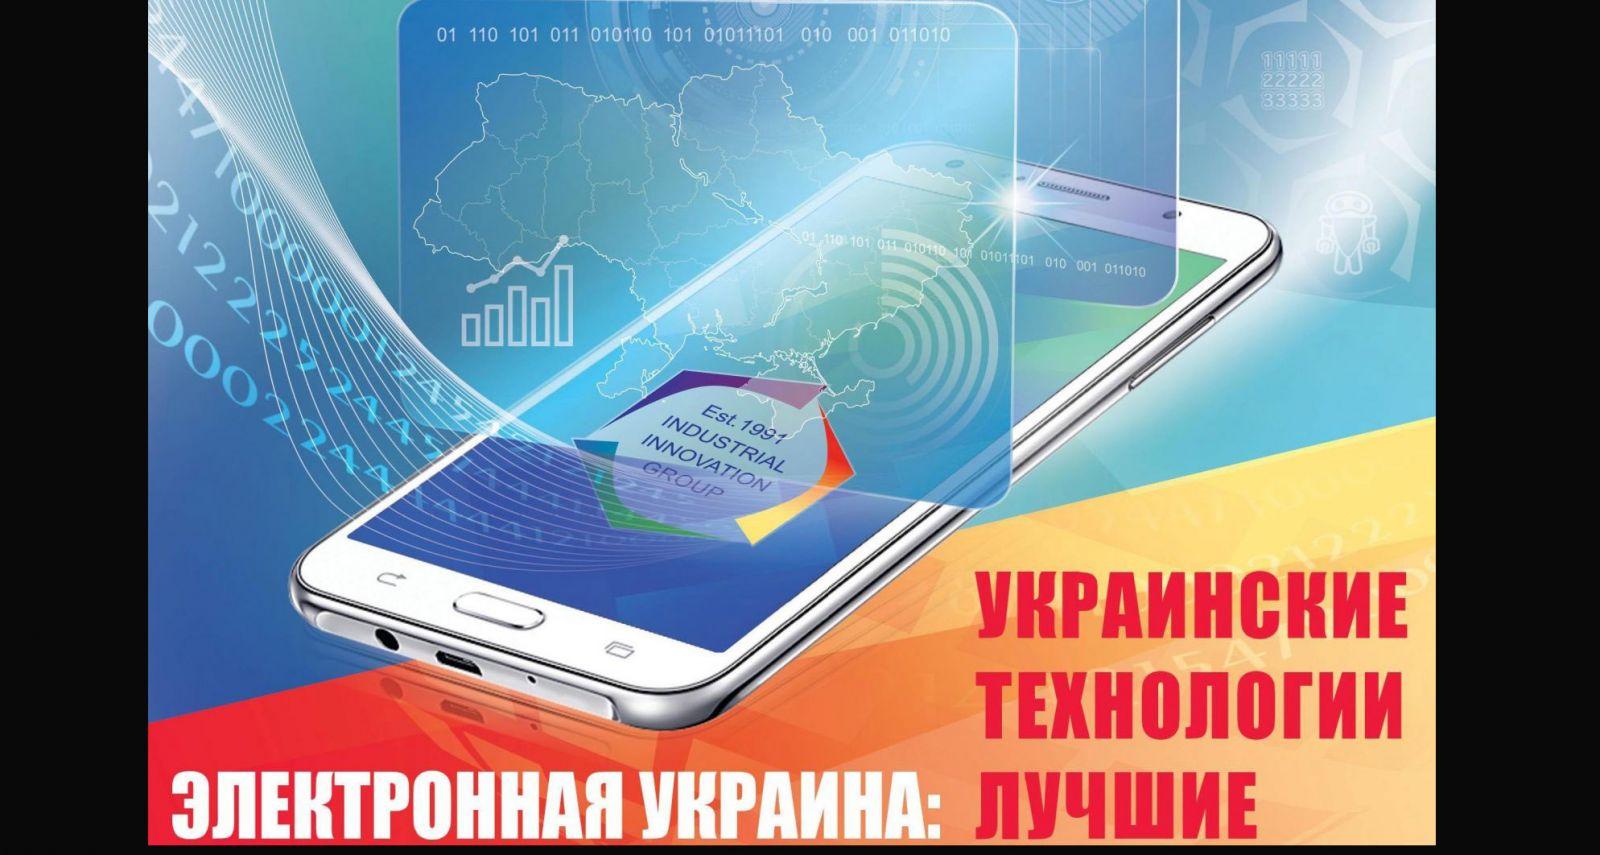 Электронная Украина: спецпроект с Industrial Innovation Group